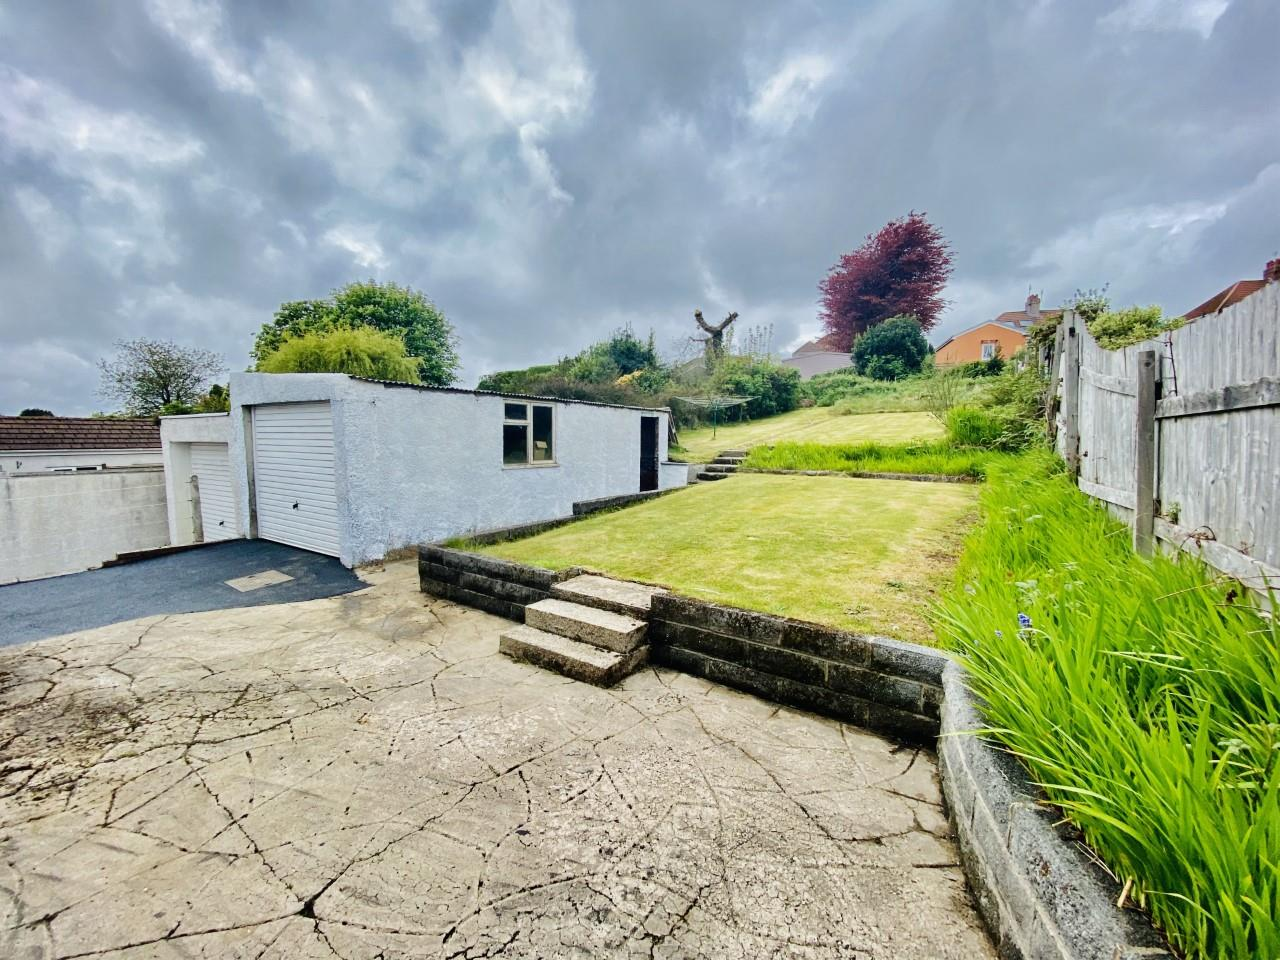 Wimmerfield Crescent, Killay, Swansea, SA2 7DB